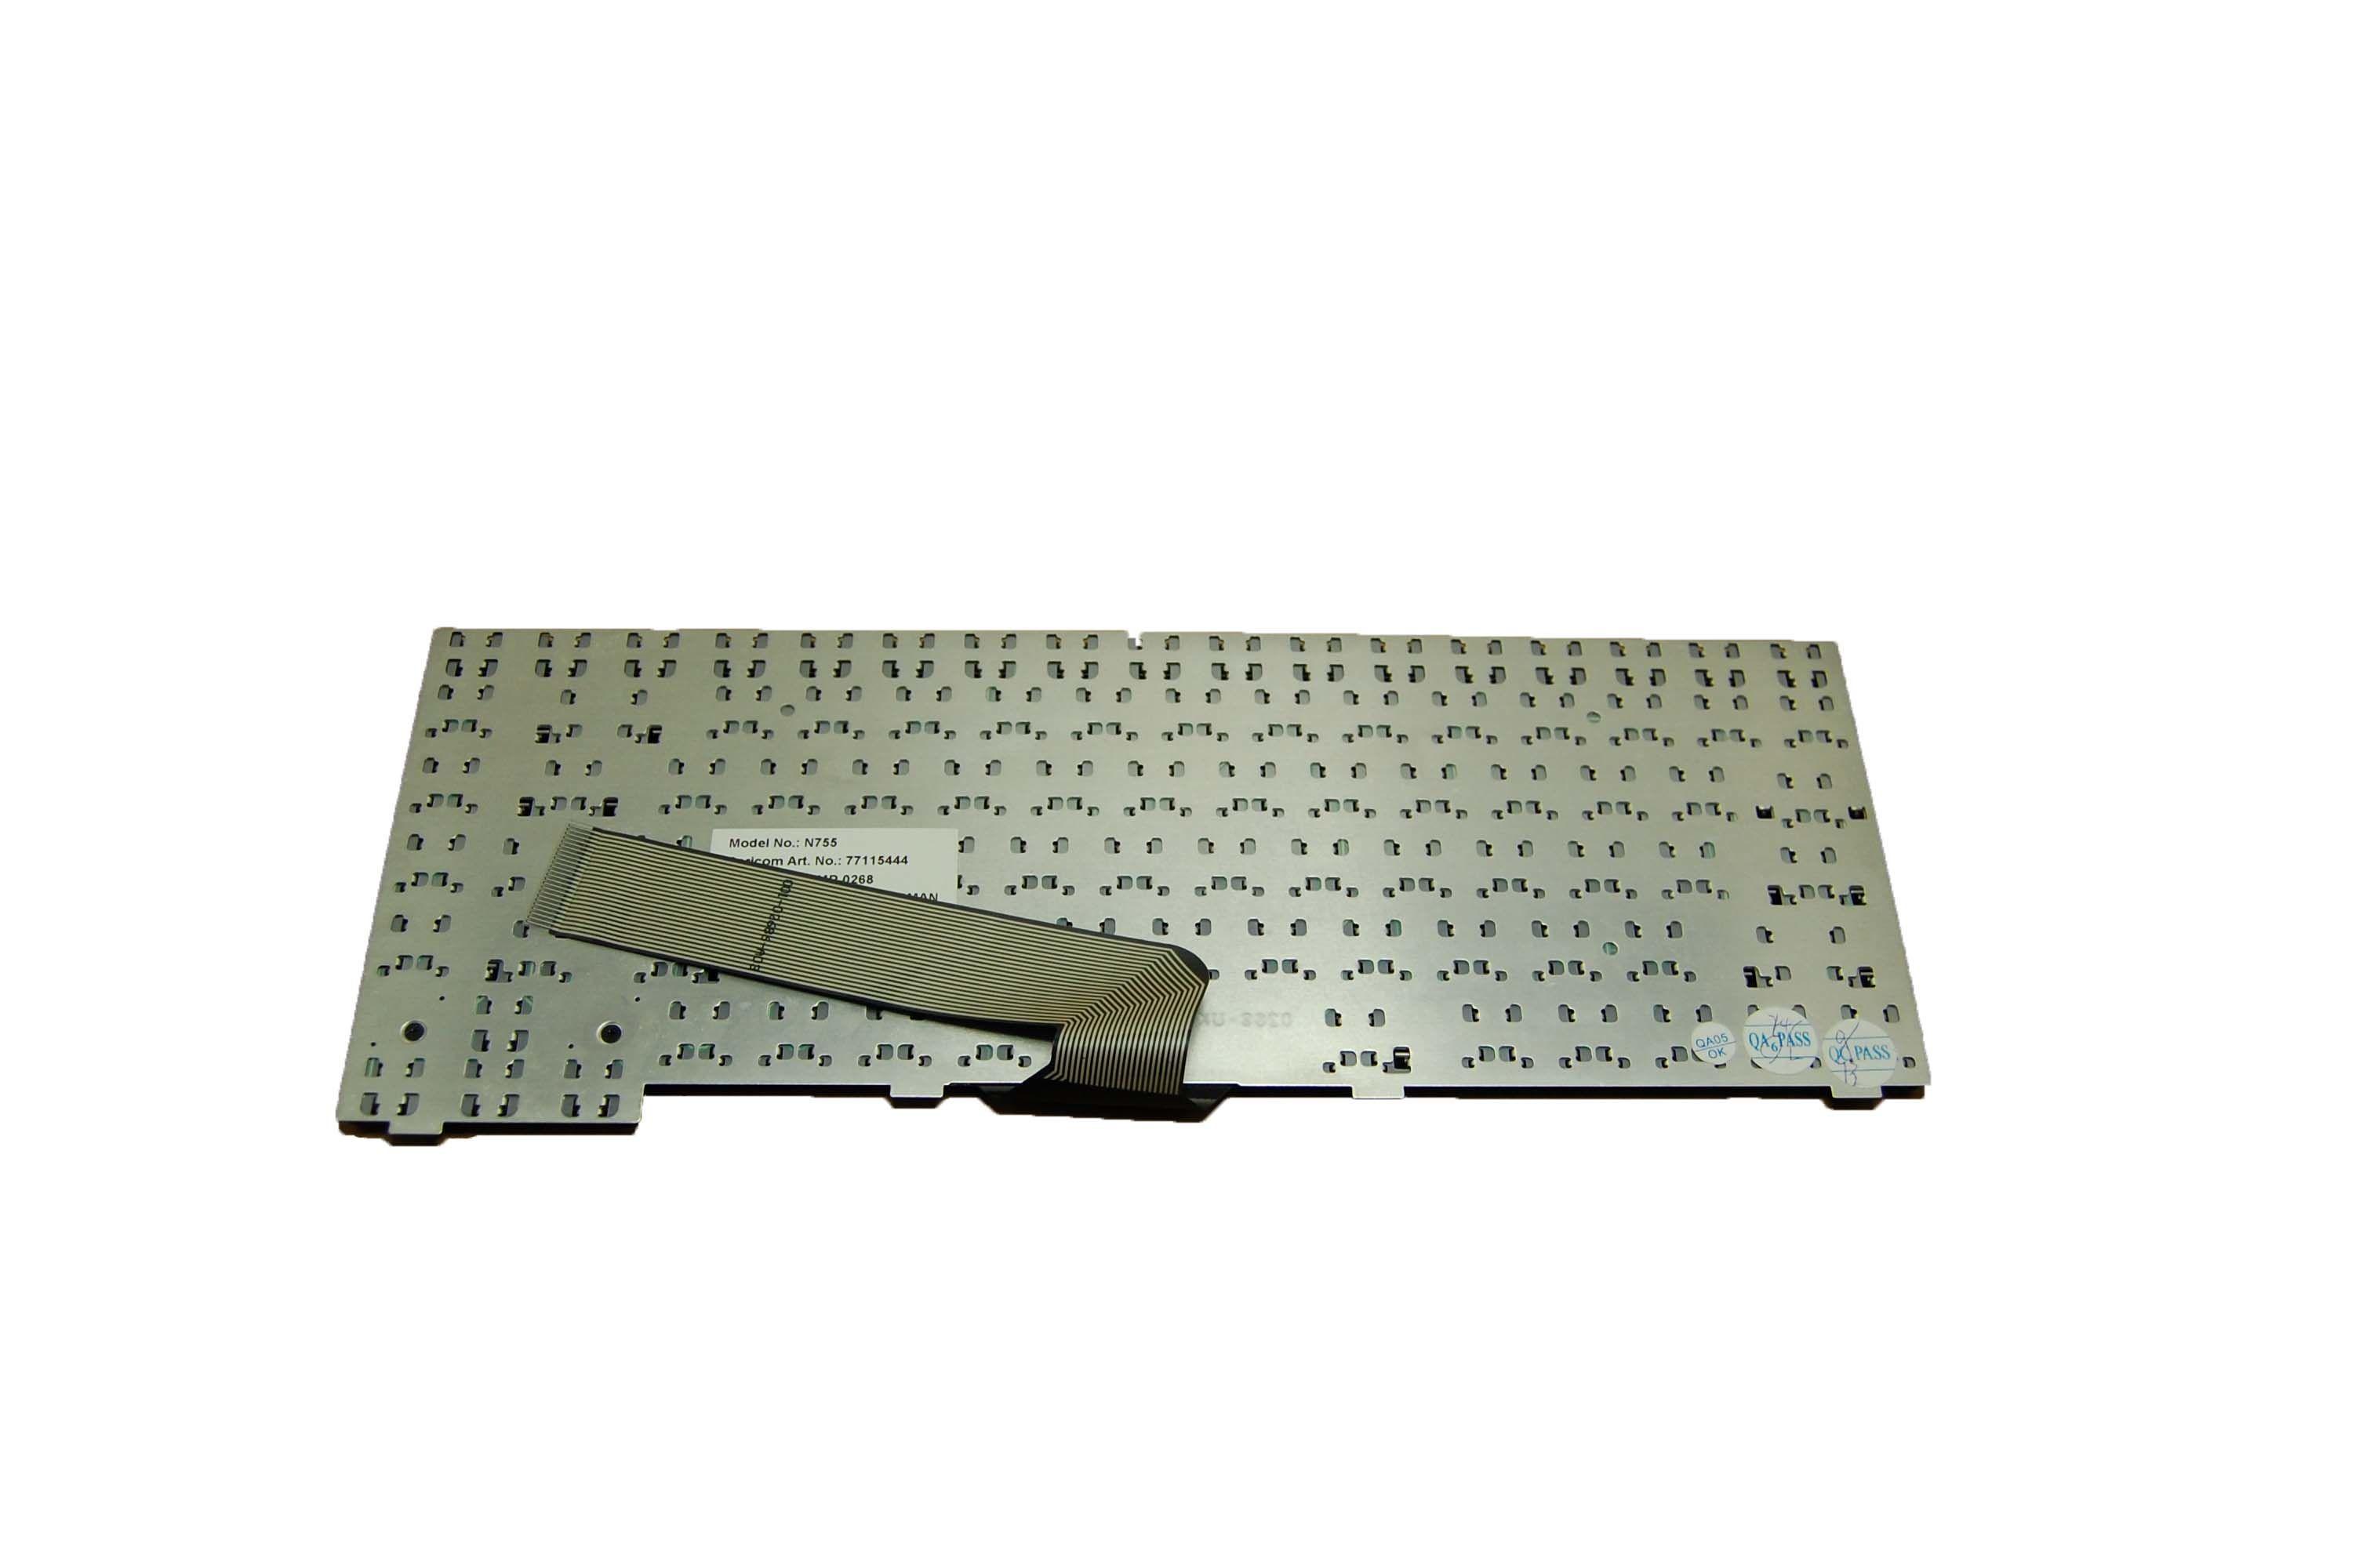 Tastatur für Fujitsu Siemens Amilo M1437G